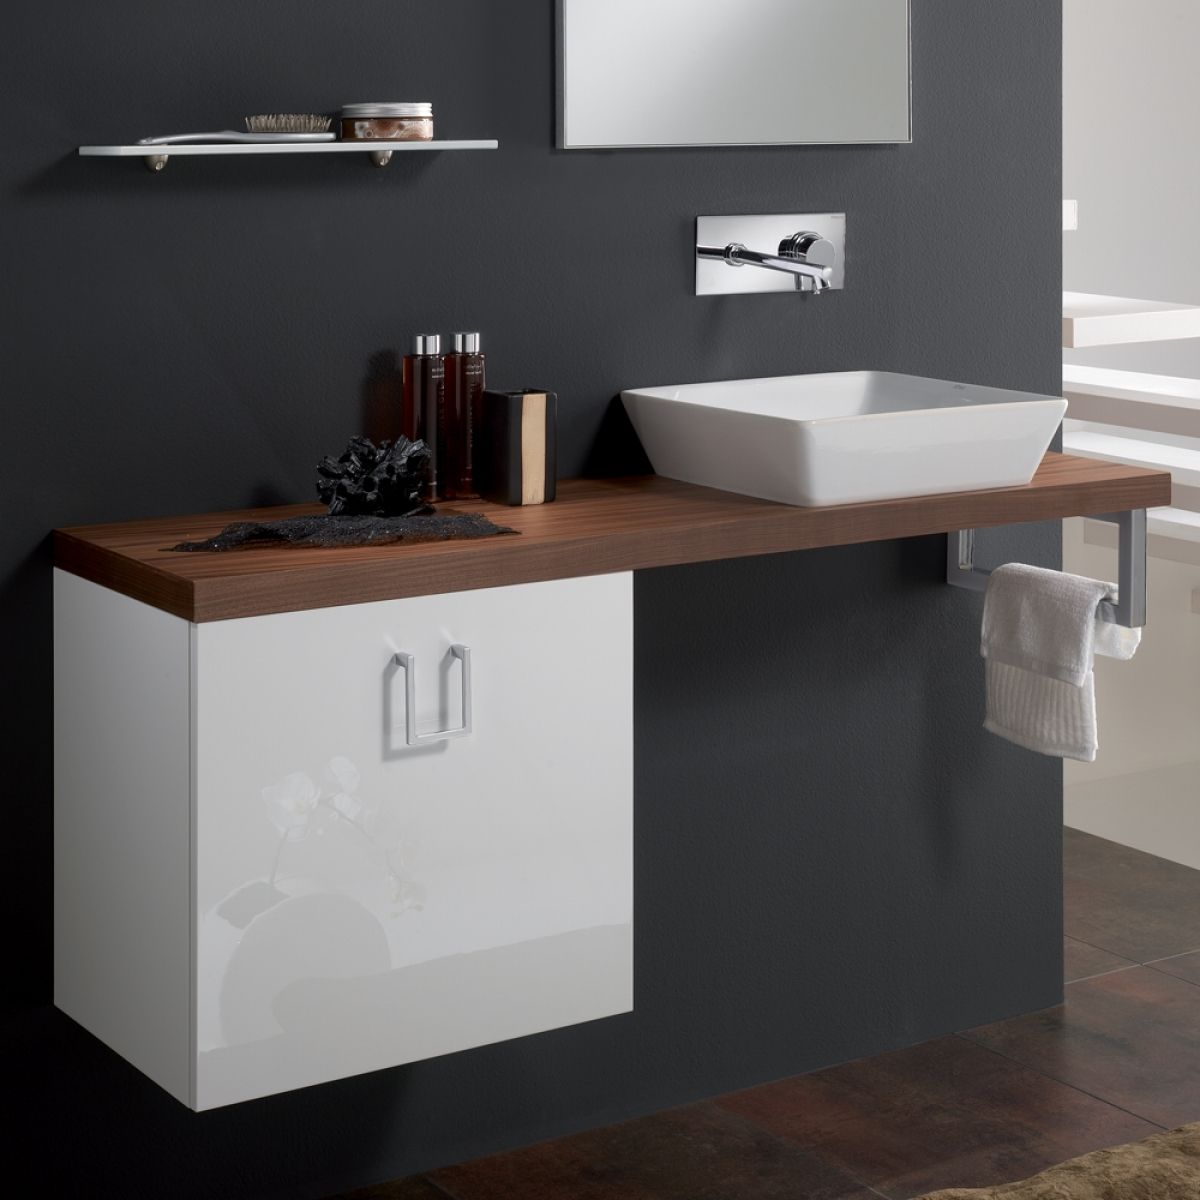 Veneered Walnut High End Bathroom Sink Vanity Stand Intended For Bathroom Cabinet For Sink Luxury Bathroom Vanities Vanity Sink Bathroom Sink Vanity